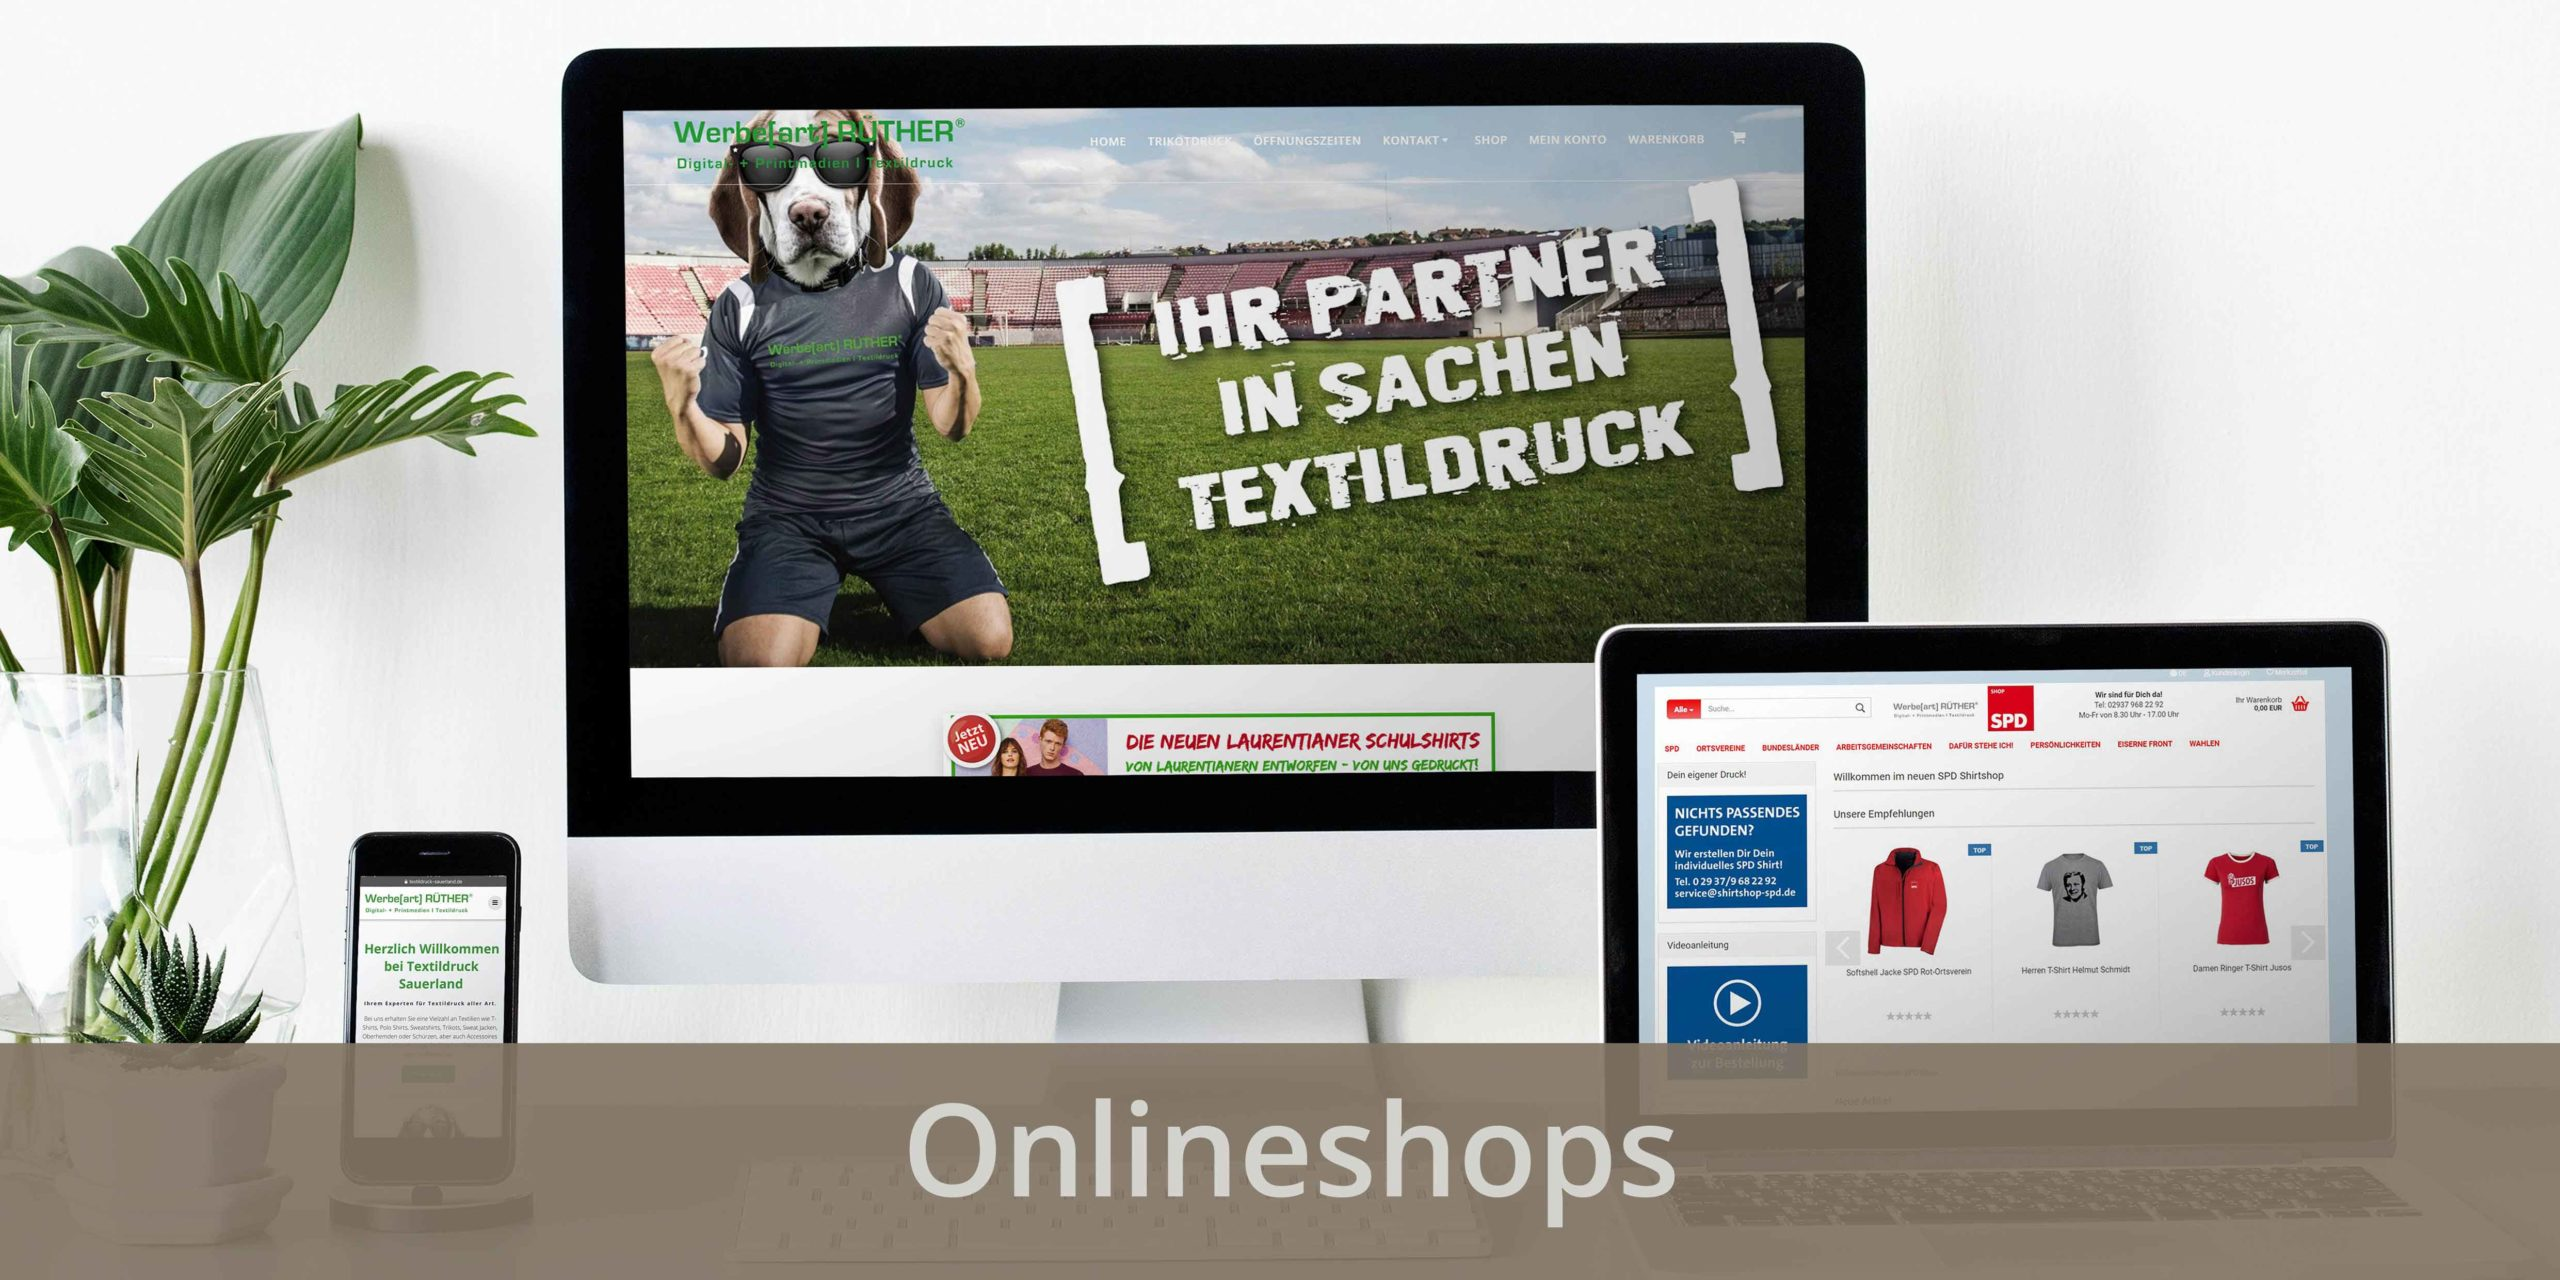 Onlineshops